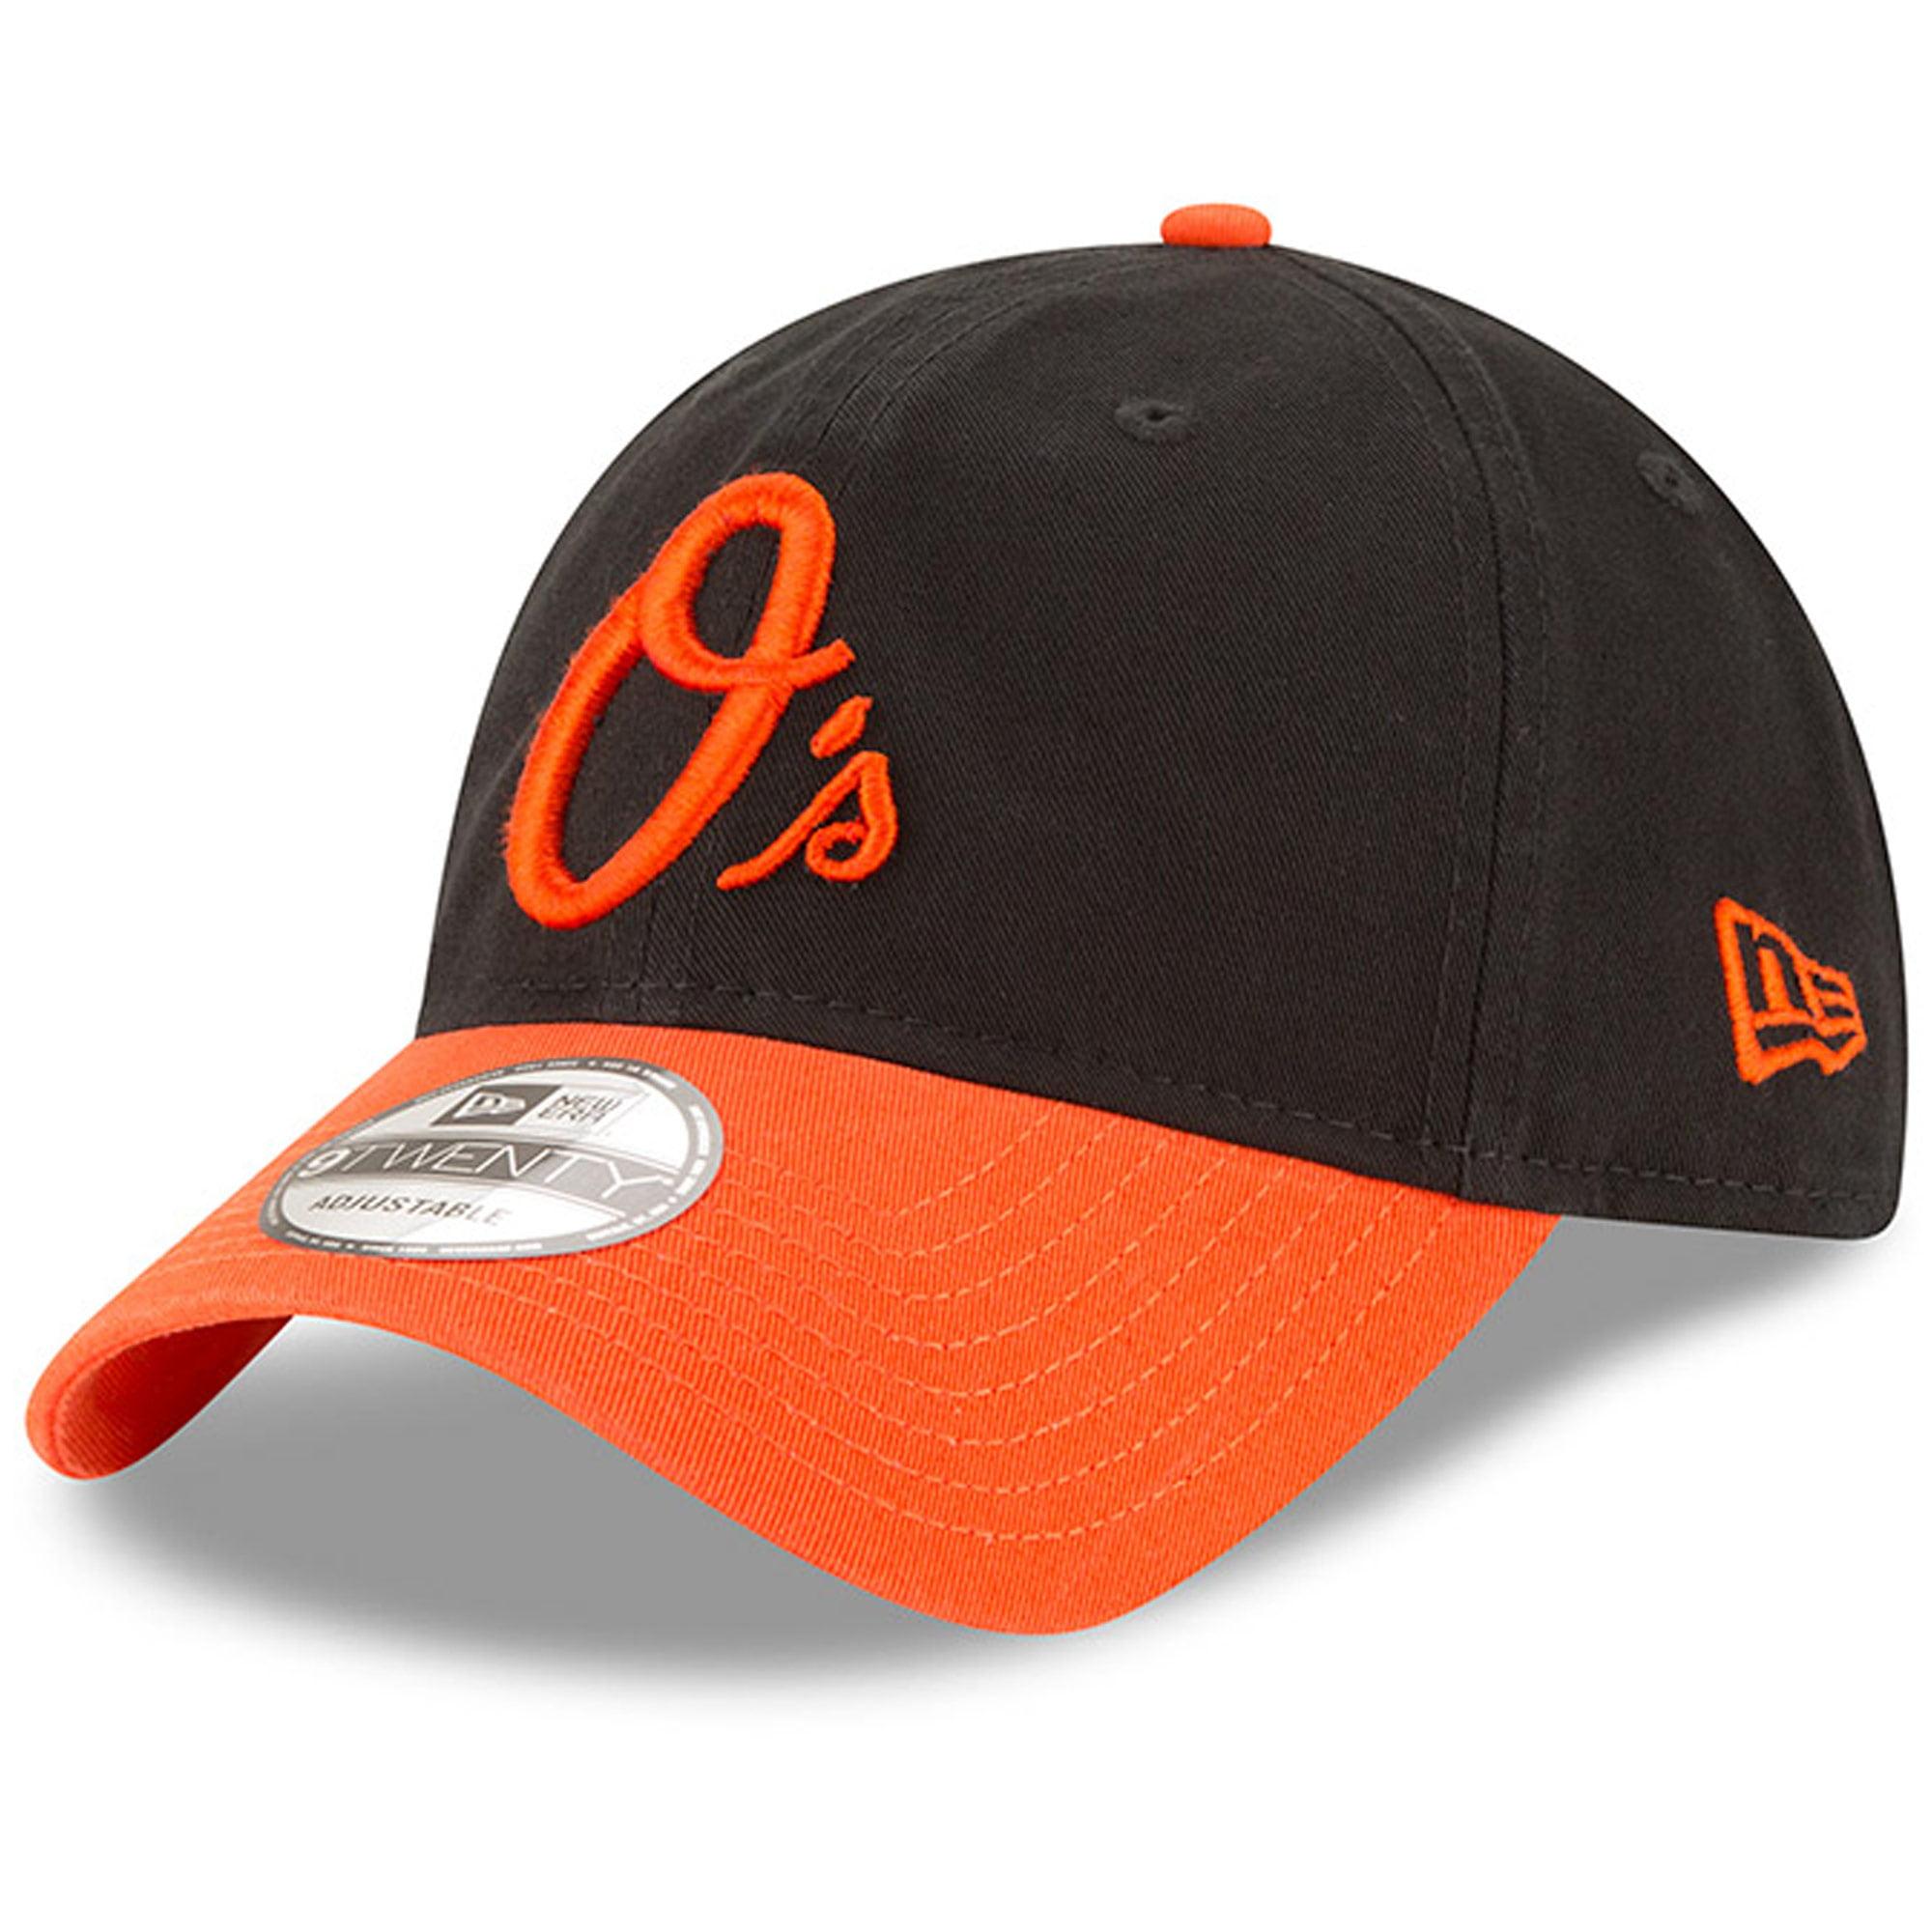 Baltimore Orioles New Era Road Replica Core Classic 9TWENTY Adjustable Hat - Black/Orange - OSFA